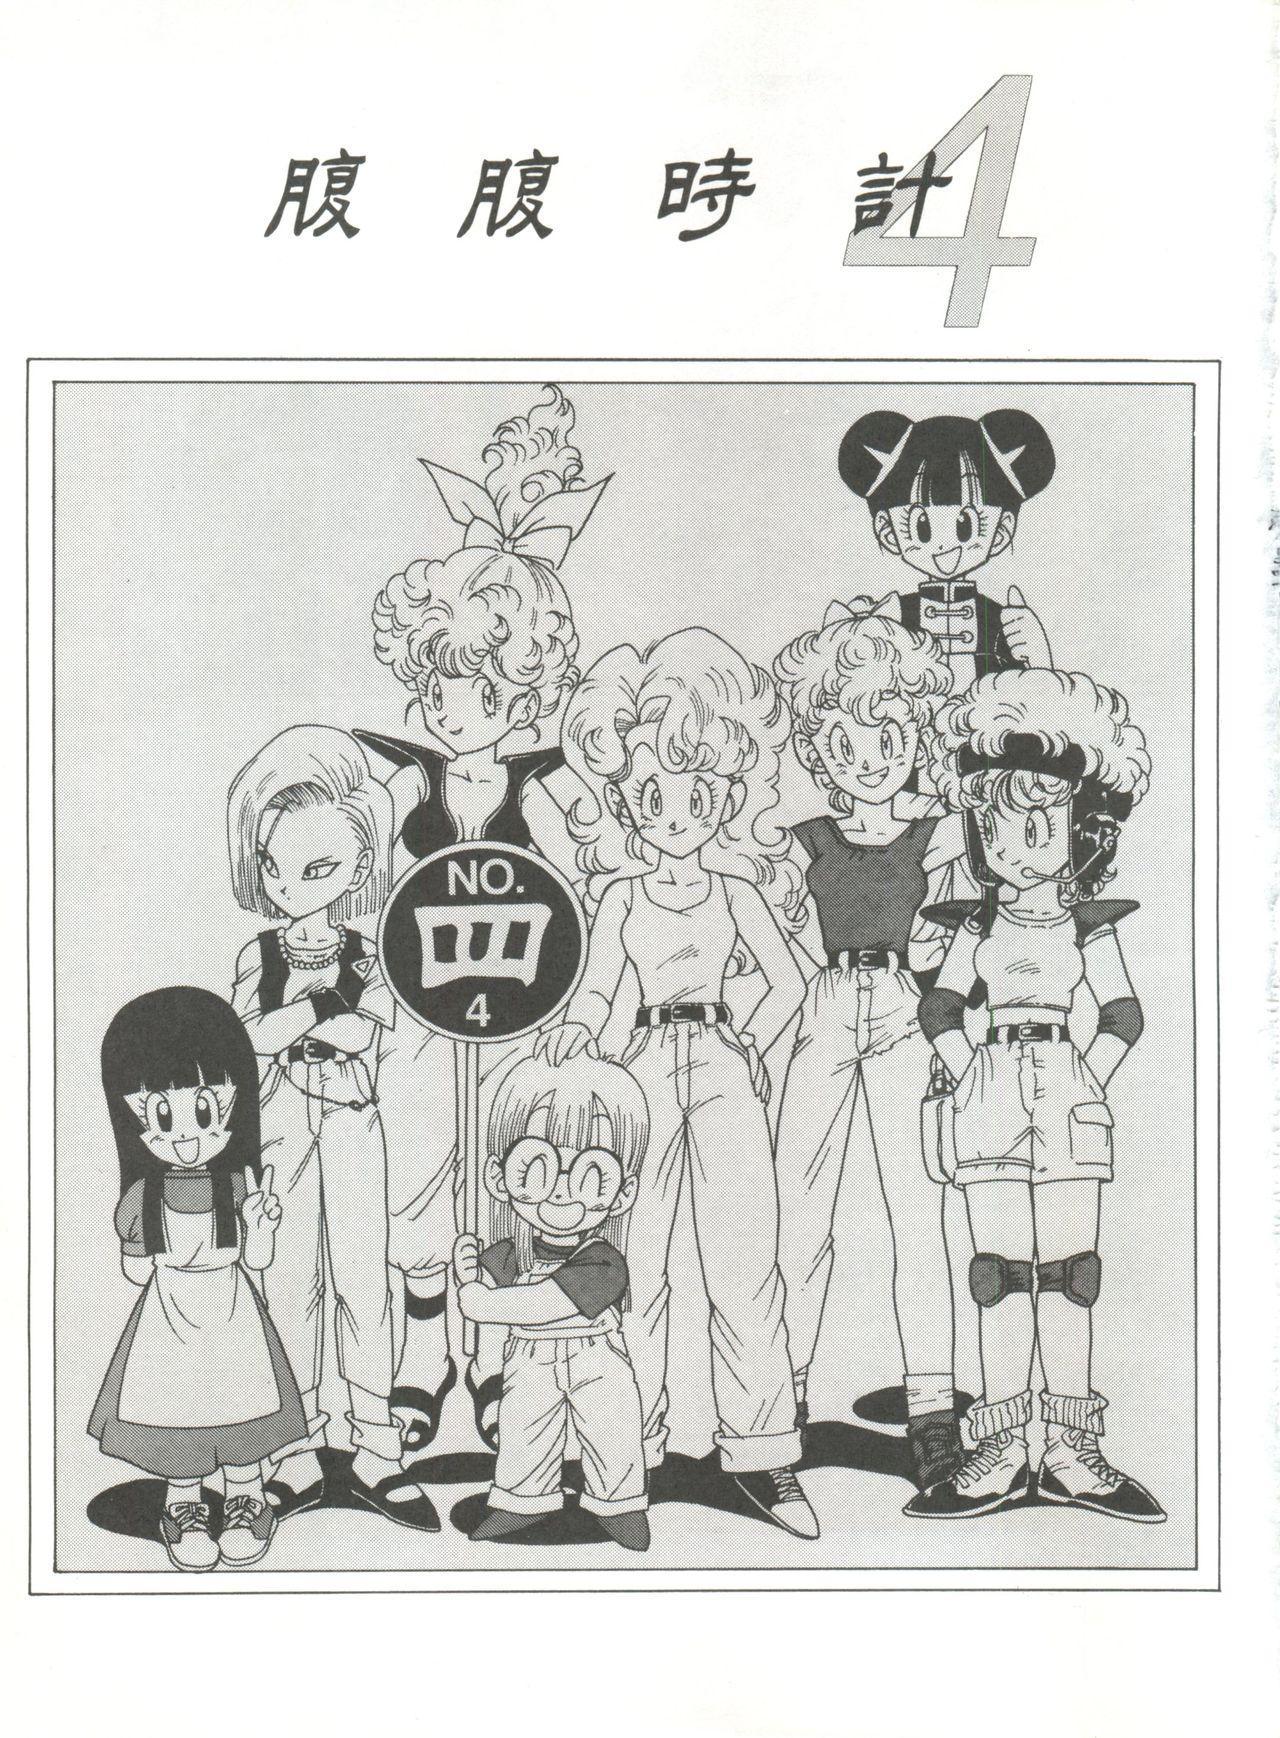 Hara Hara Dokei Vol. 4 Quattro 1